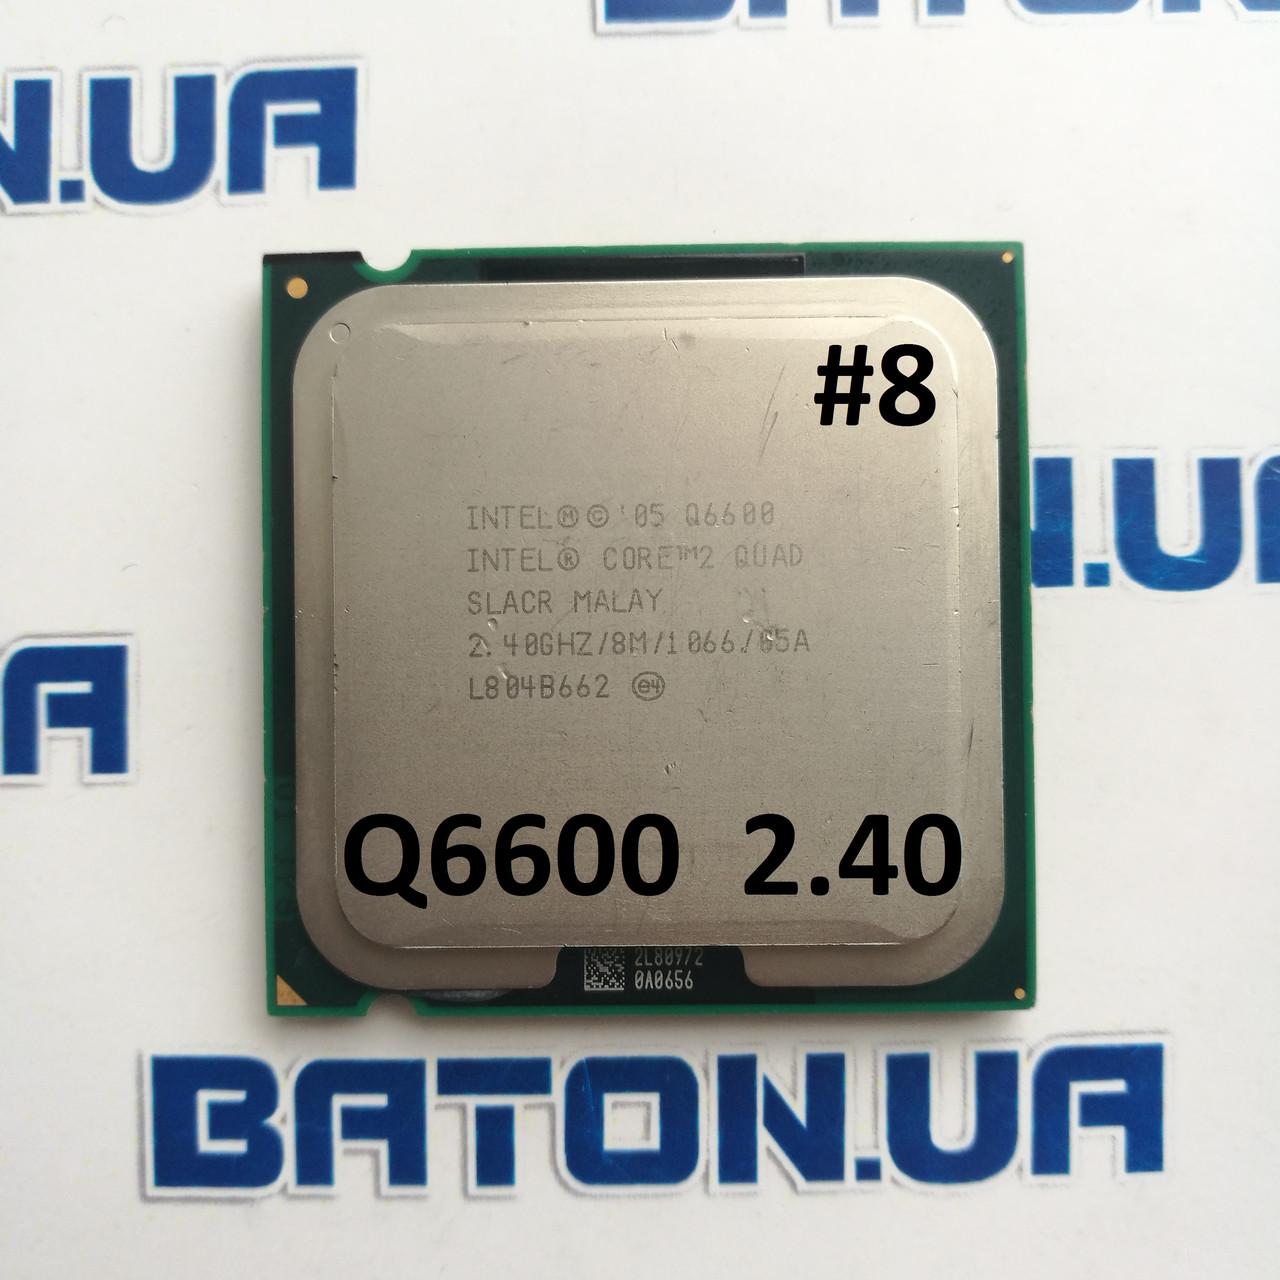 Процессор ЛОТ#8 Intel® Core™2 Quad Q6600 2.4GHz 8M Cache 1066 MHz FSB Soket 775